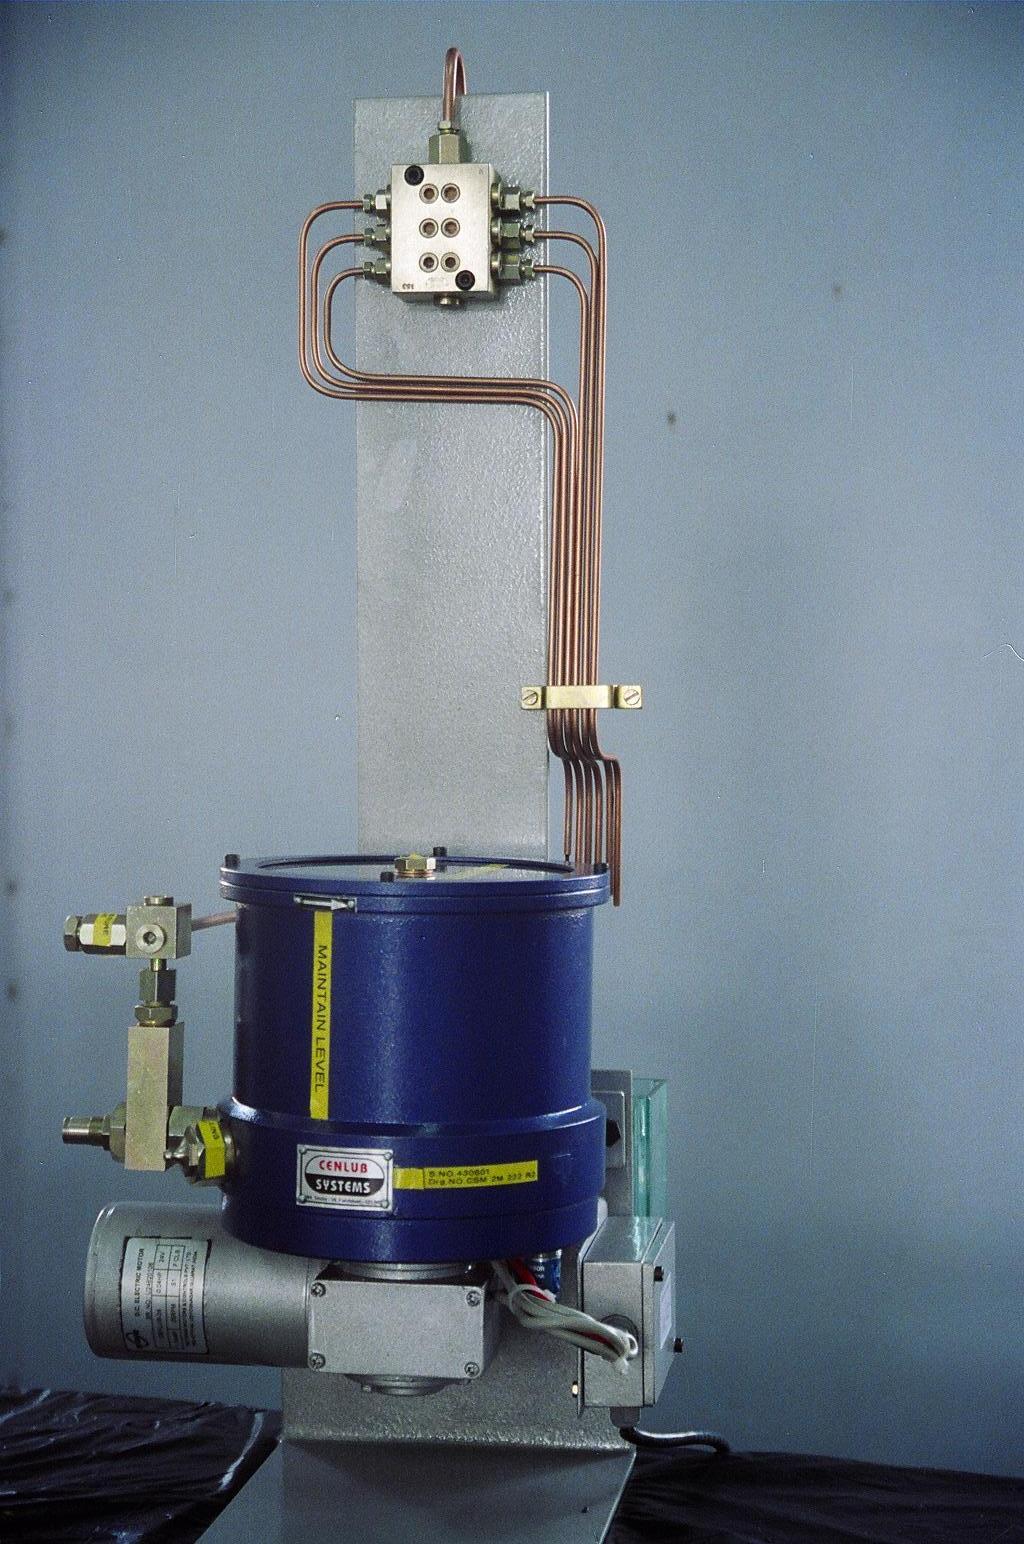 24volt multipoint lubricator